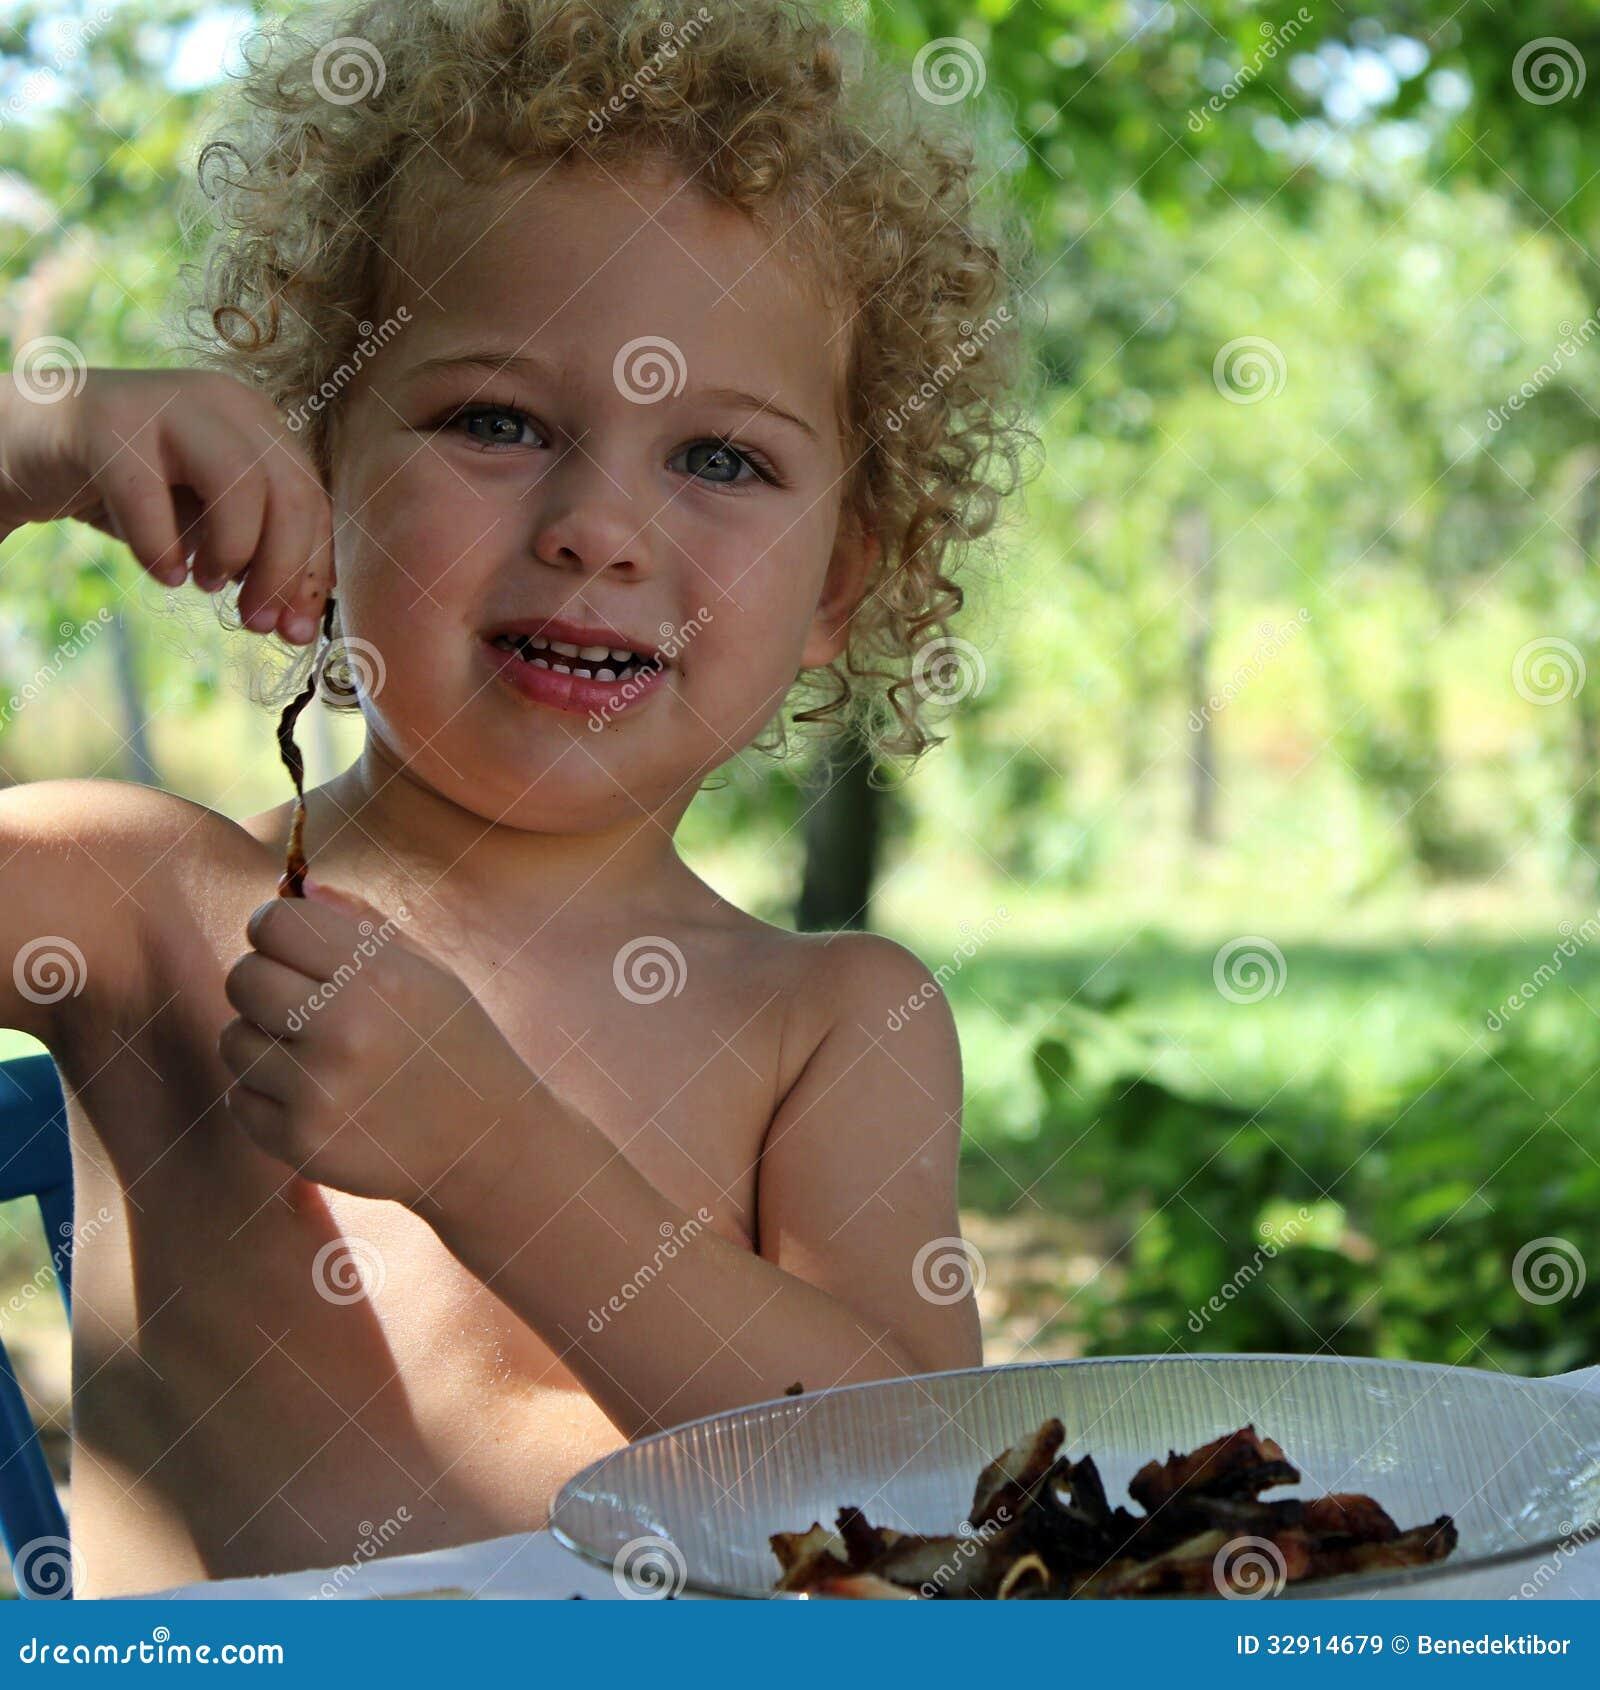 Portrait of a little boy eating in the garden